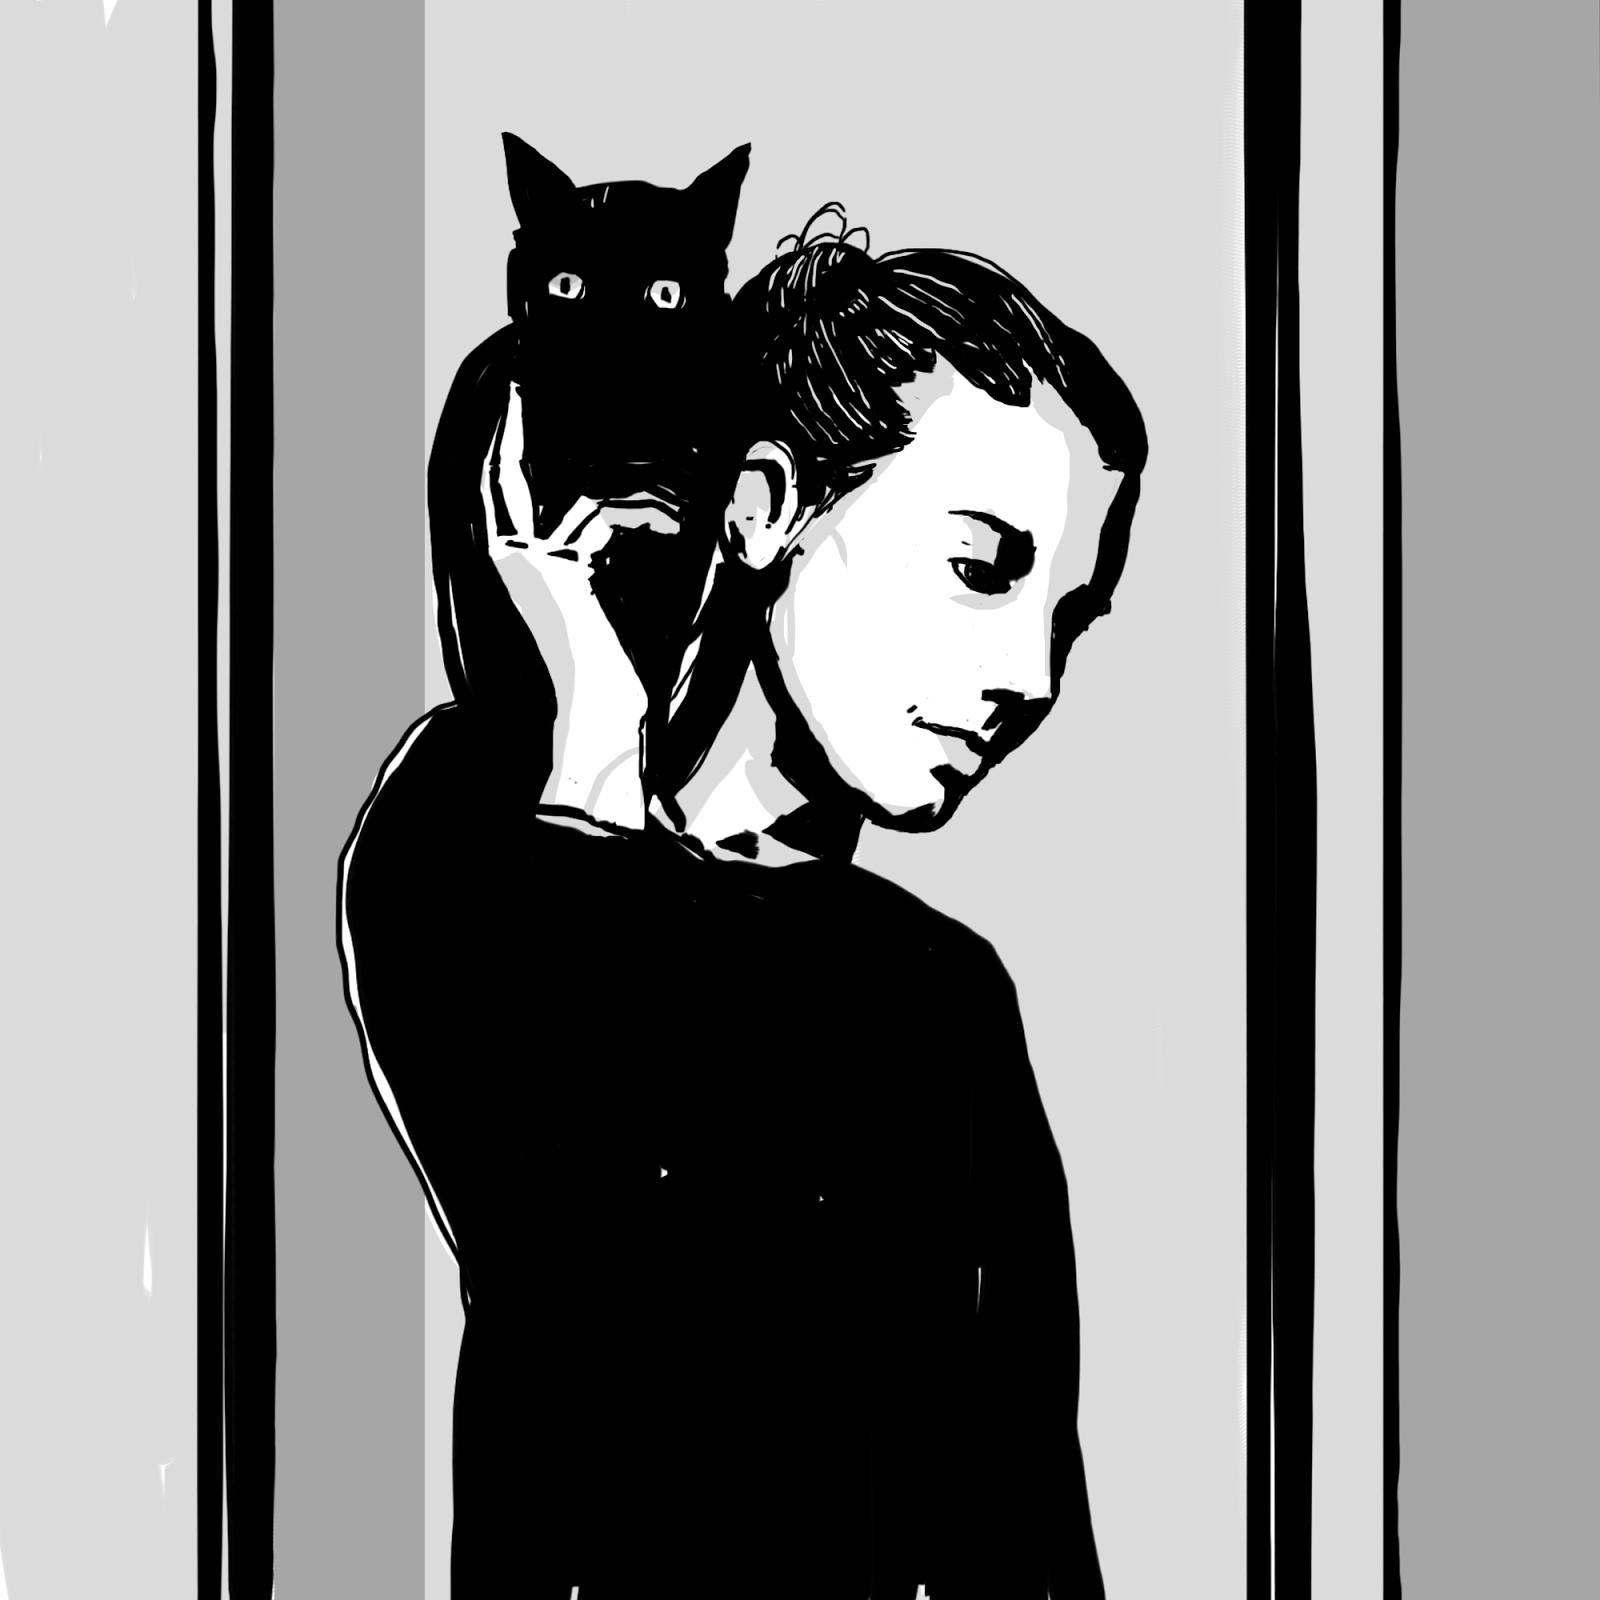 The Cat Lady Digital Drawing 1500x1500px Mujer Gato f8f86f6eb02